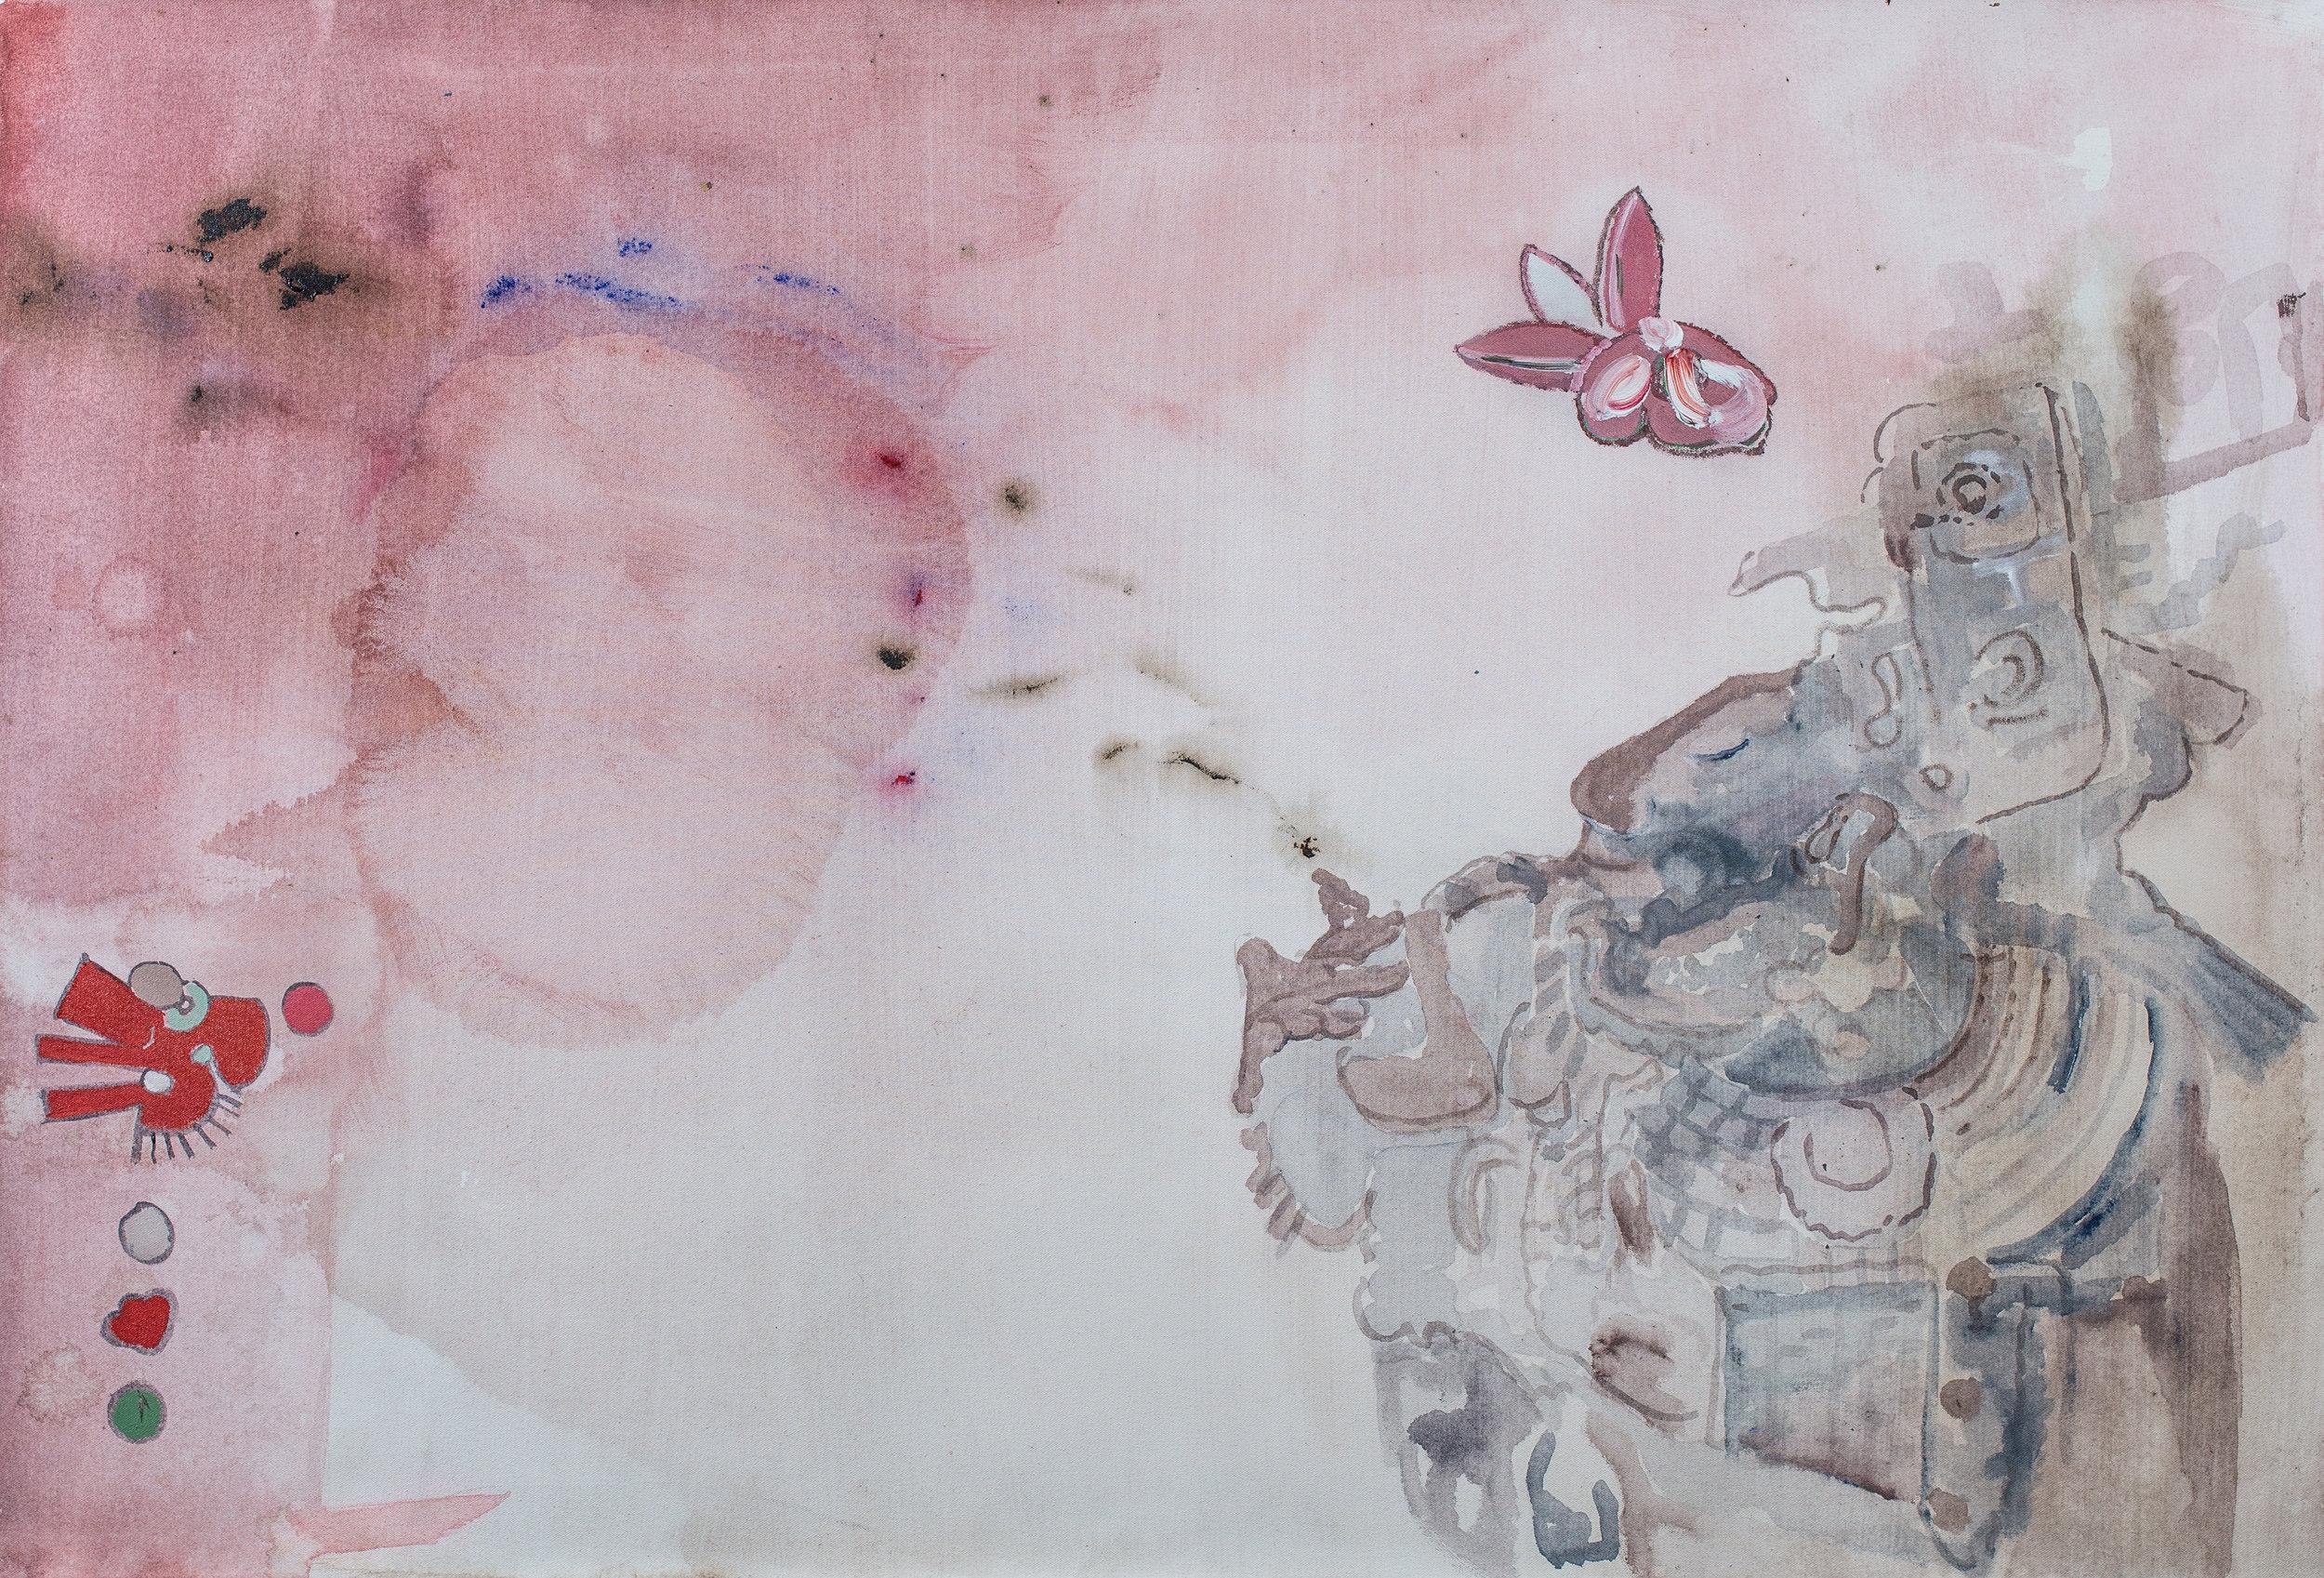 Sueño   Acrylic pigments on Canvas  48 x 32 Inches  2019